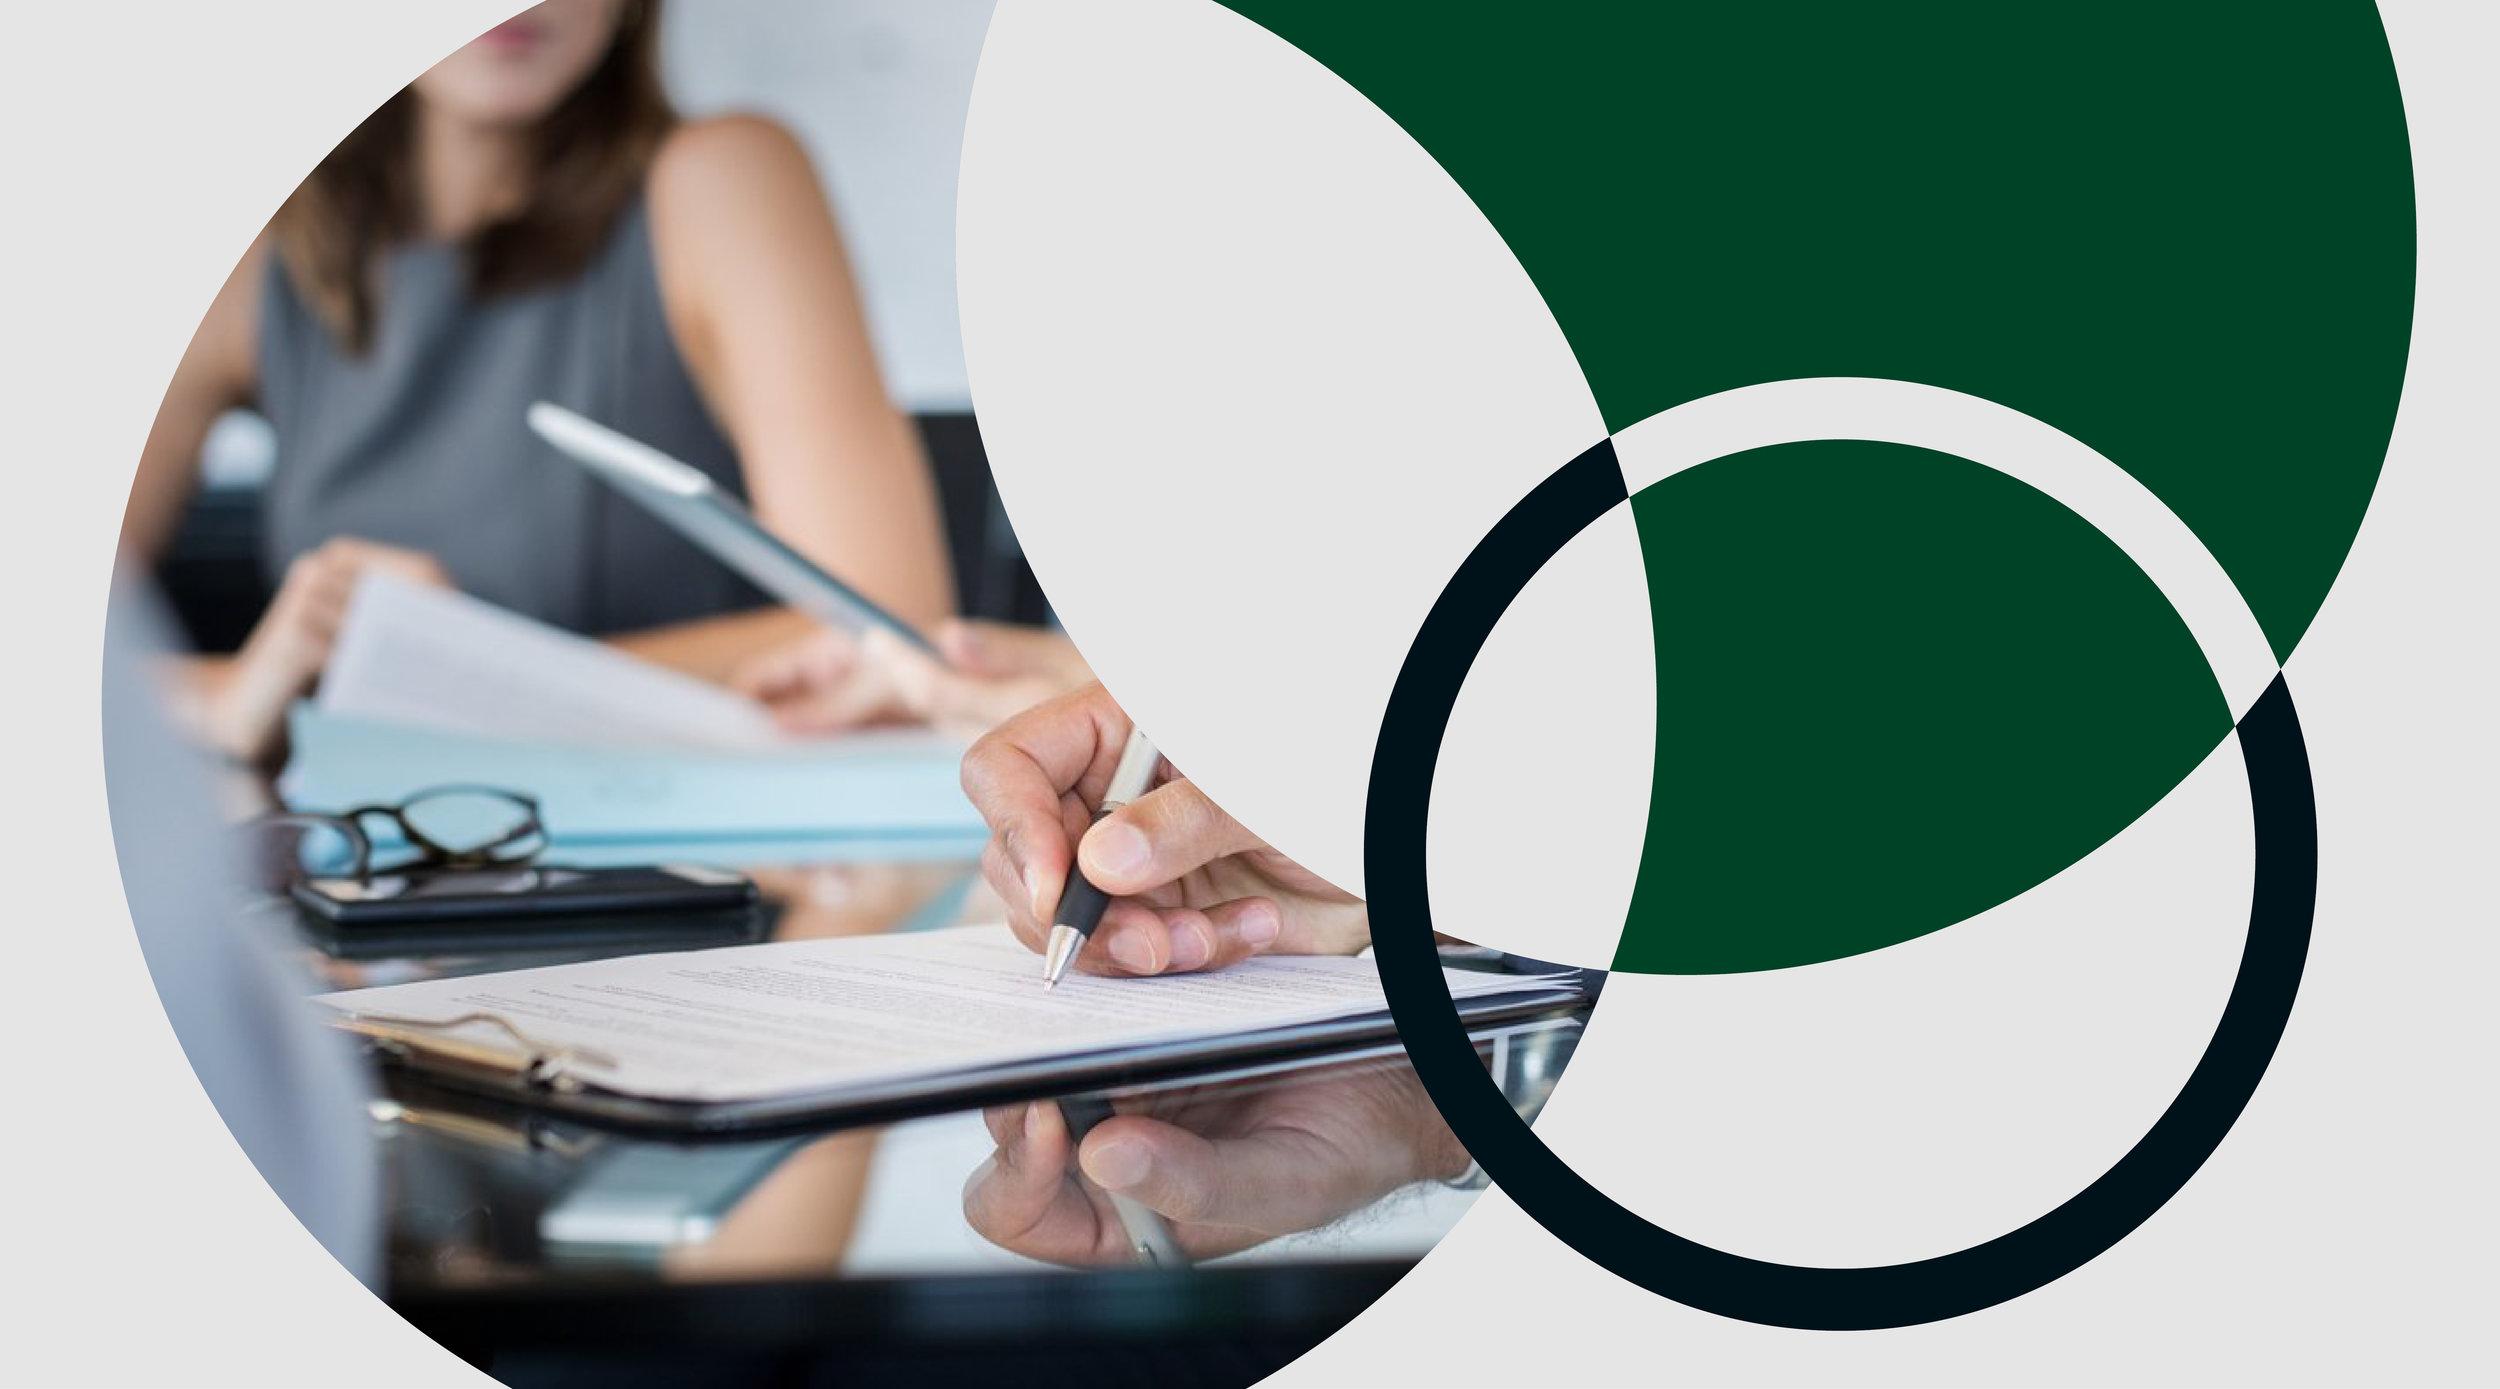 Oakridge - Brand Images - Circles8.jpg